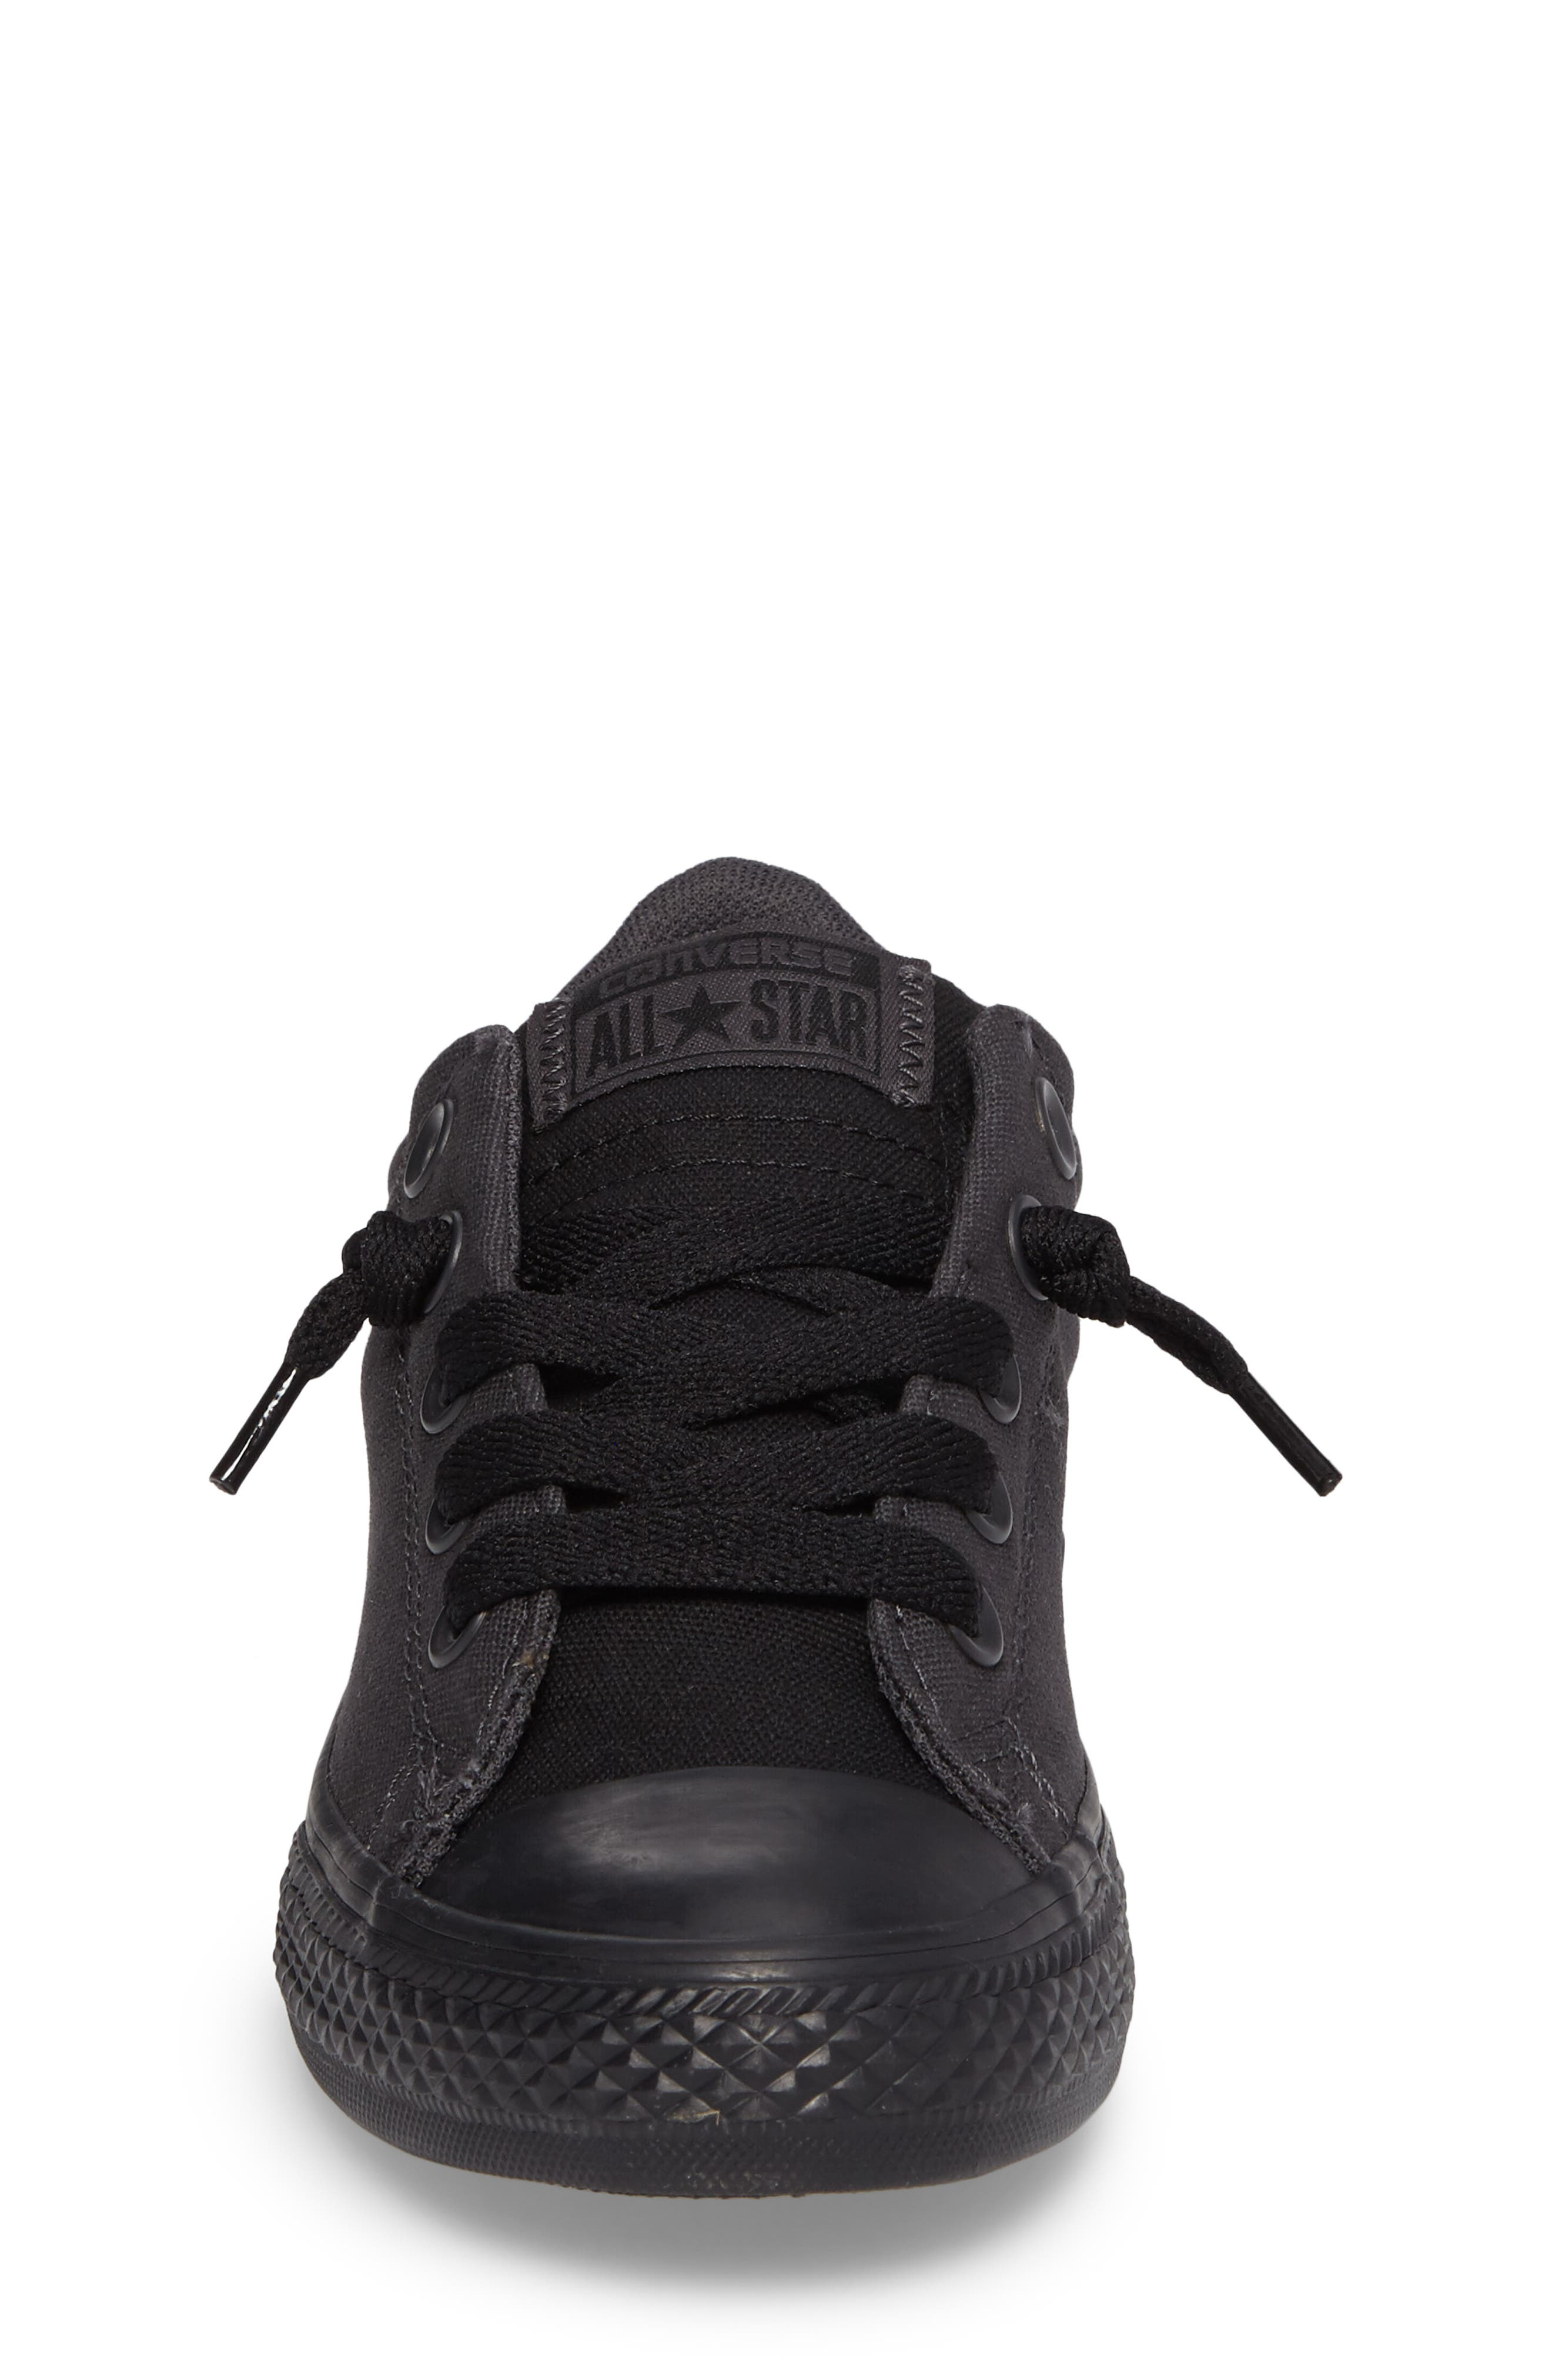 Alternate Image 4  - Converse All Star® Street Slip Low Top Sneaker (Toddler, Little Kid & Big Kid)